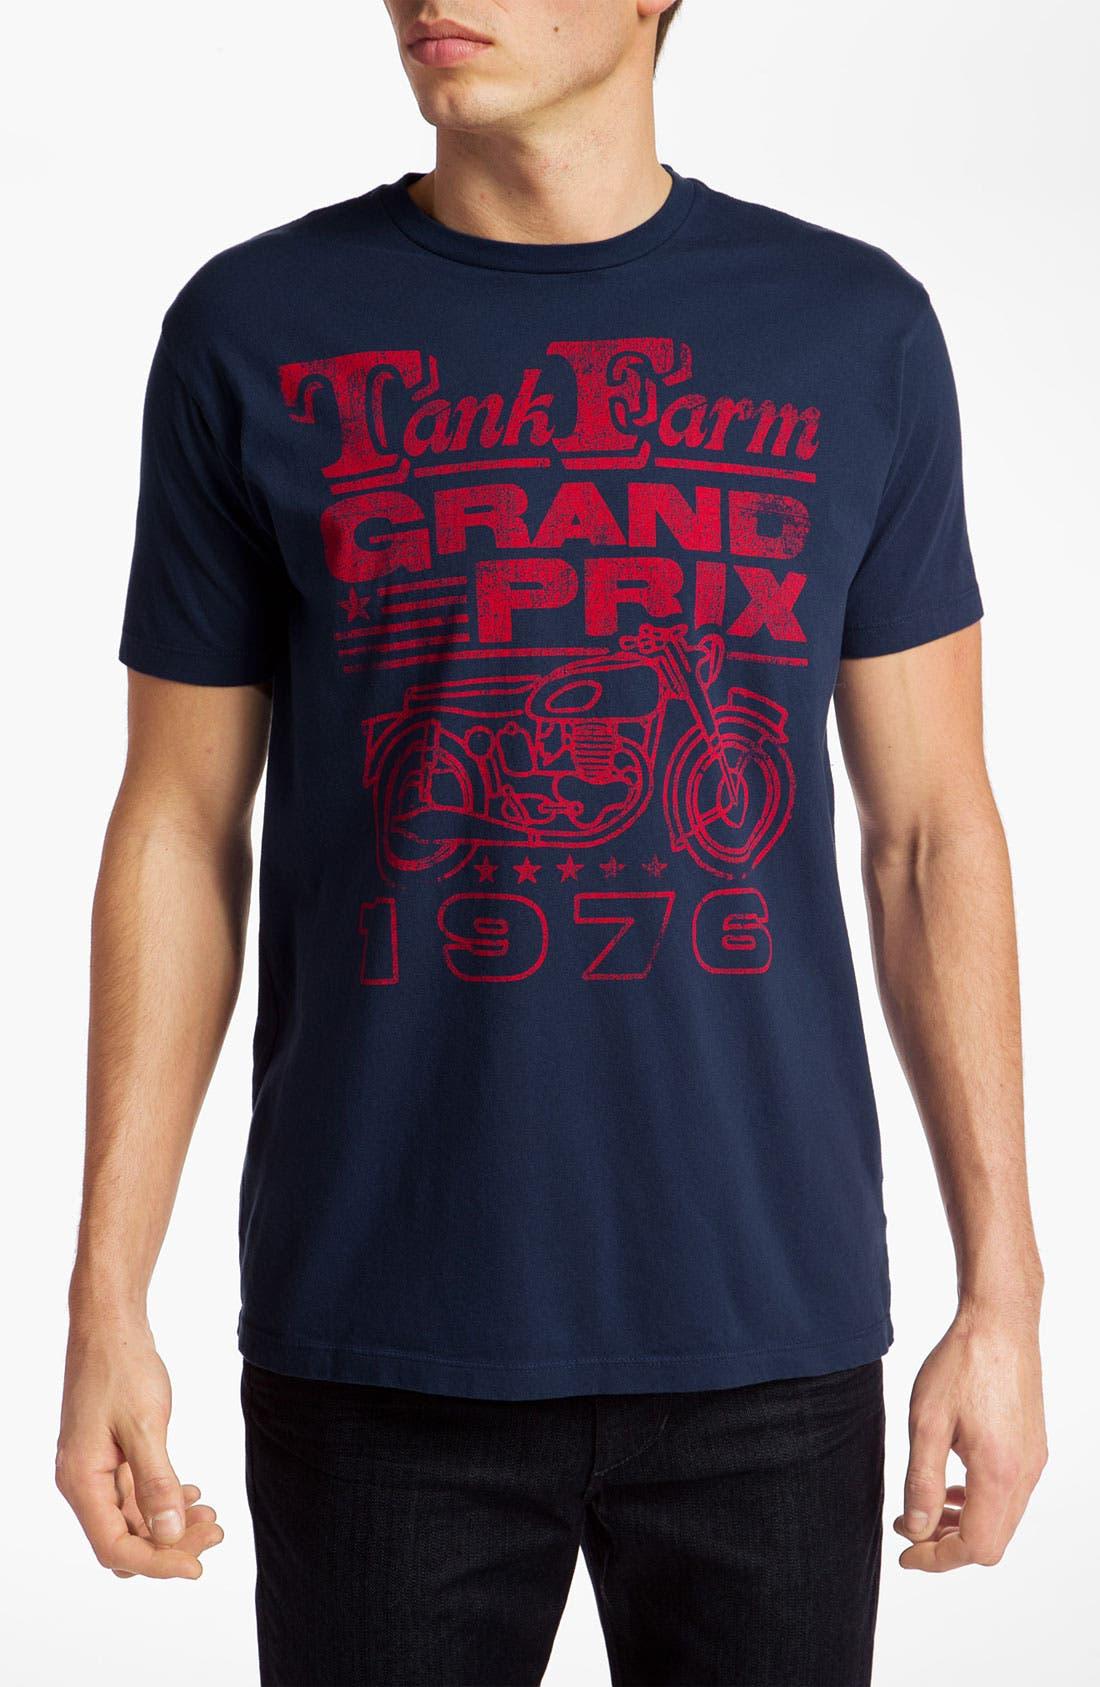 Main Image - Tankfarm 'Grand Prix' Graphic T-Shirt